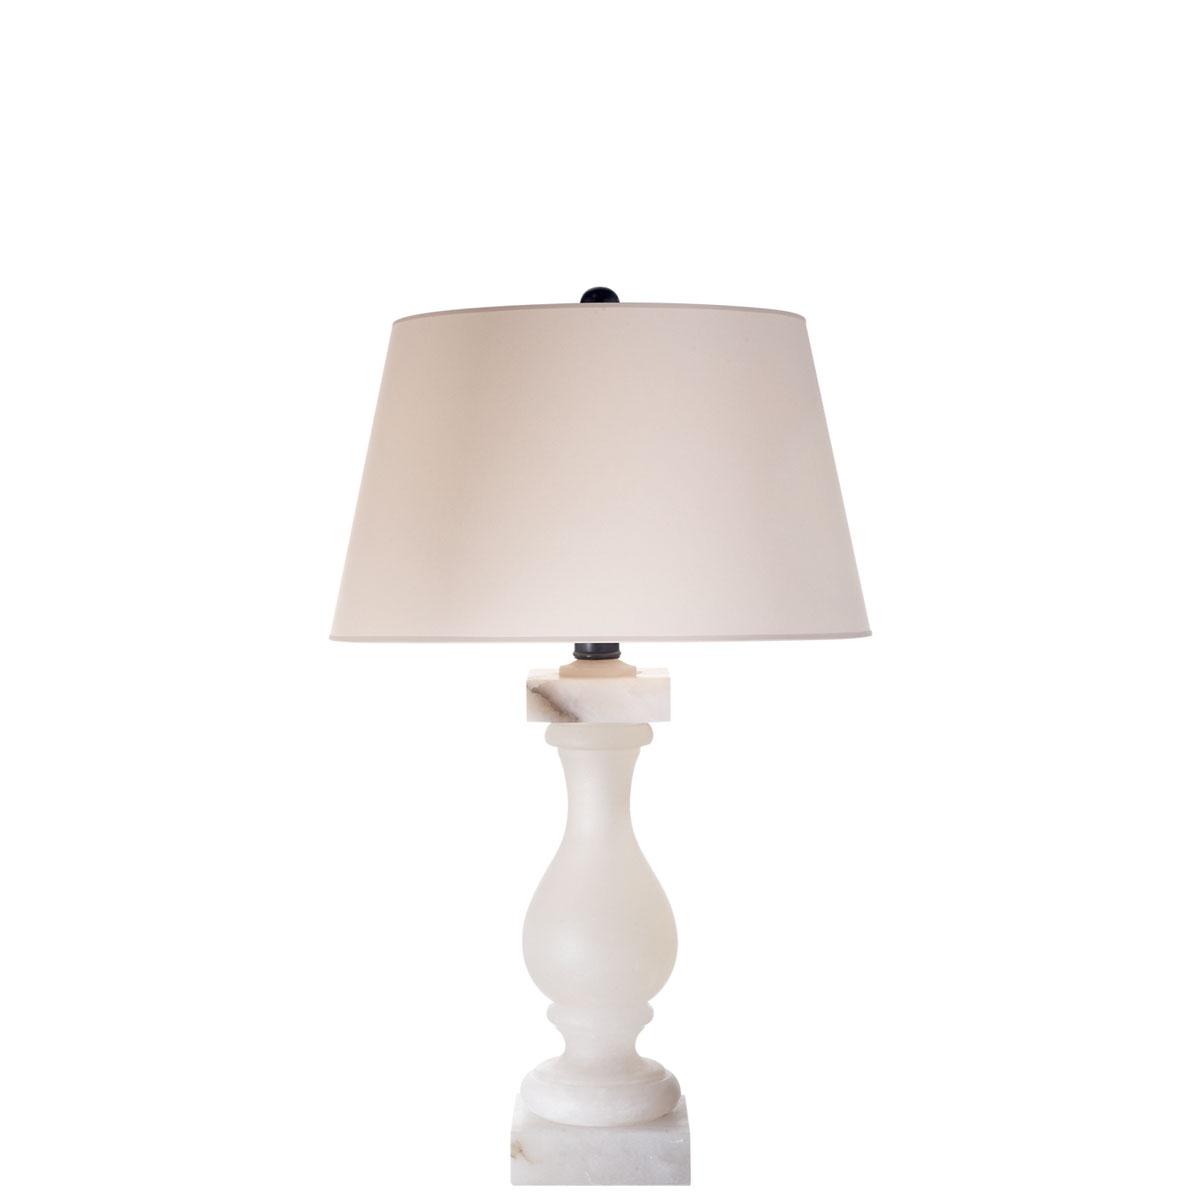 Barade Table Lamp